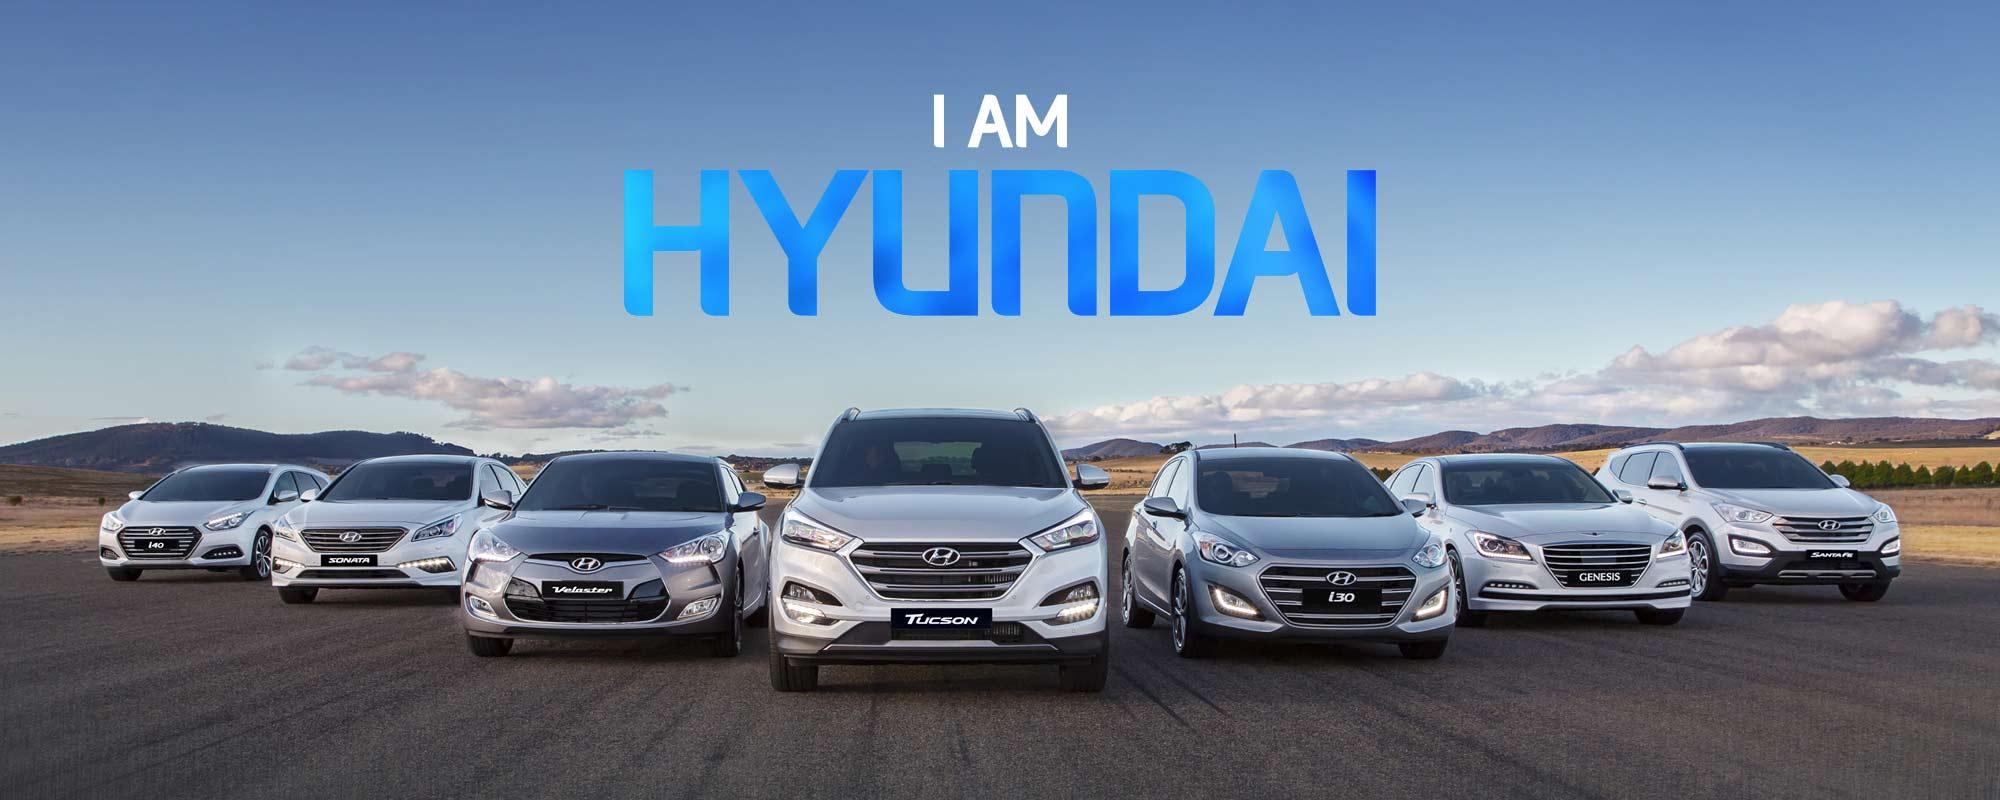 Full range of Hyundai models available at Brendale Hyundai.